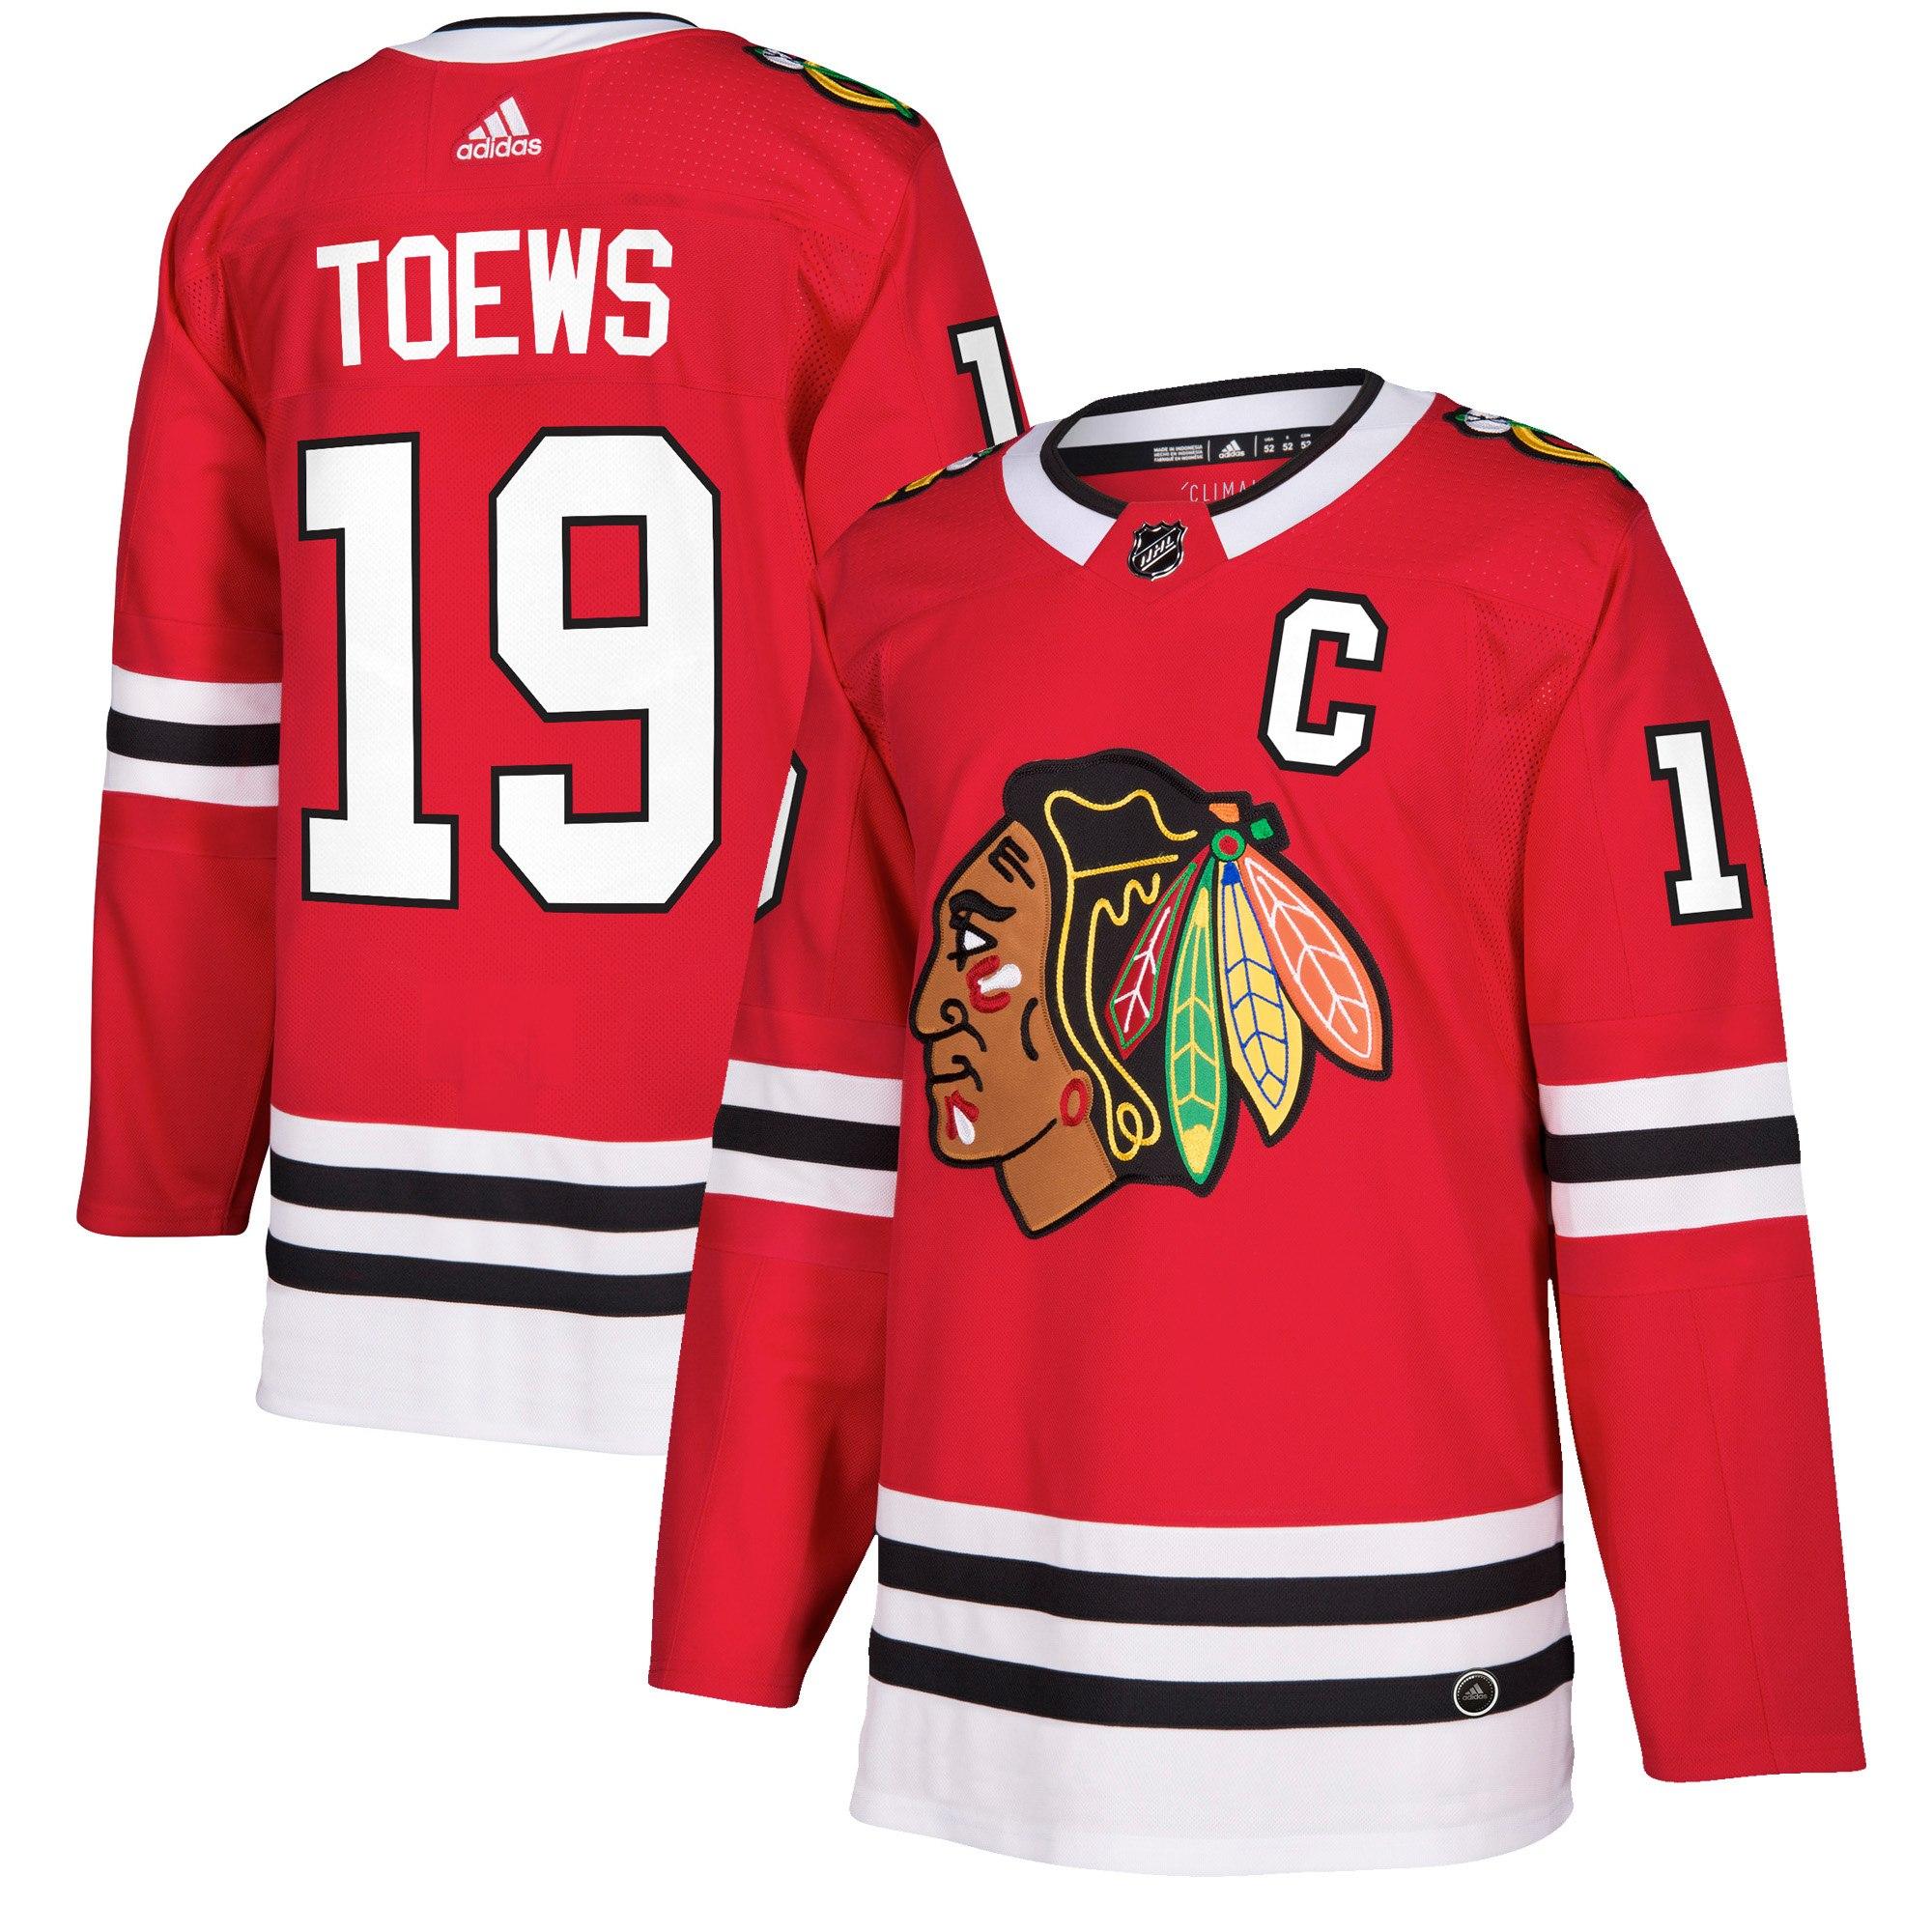 Adidas Dres Chicago Blackhawks #19 Jonathan Toews adizero Home Authentic Player Pro Velikost: L, Distribuce: USA